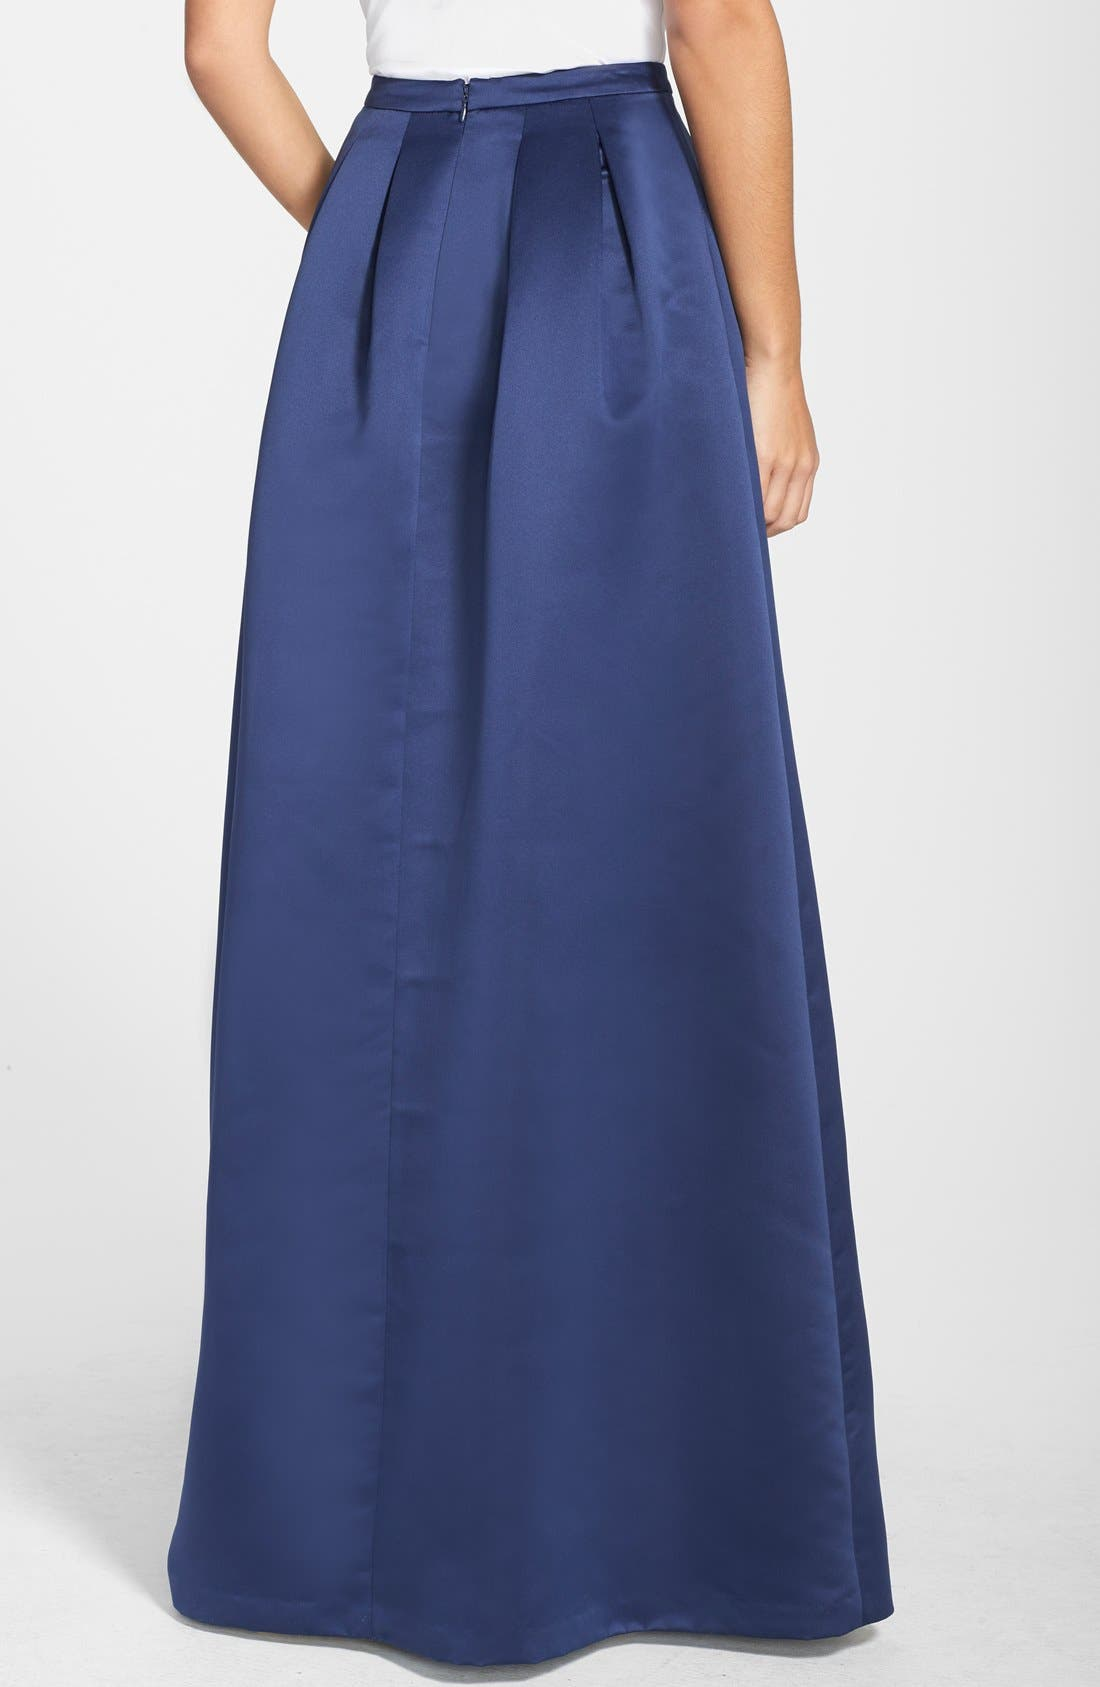 Alternate Image 2  - ERIN erin fetherston 'Jacqueline' Peau de Soie Ball Skirt